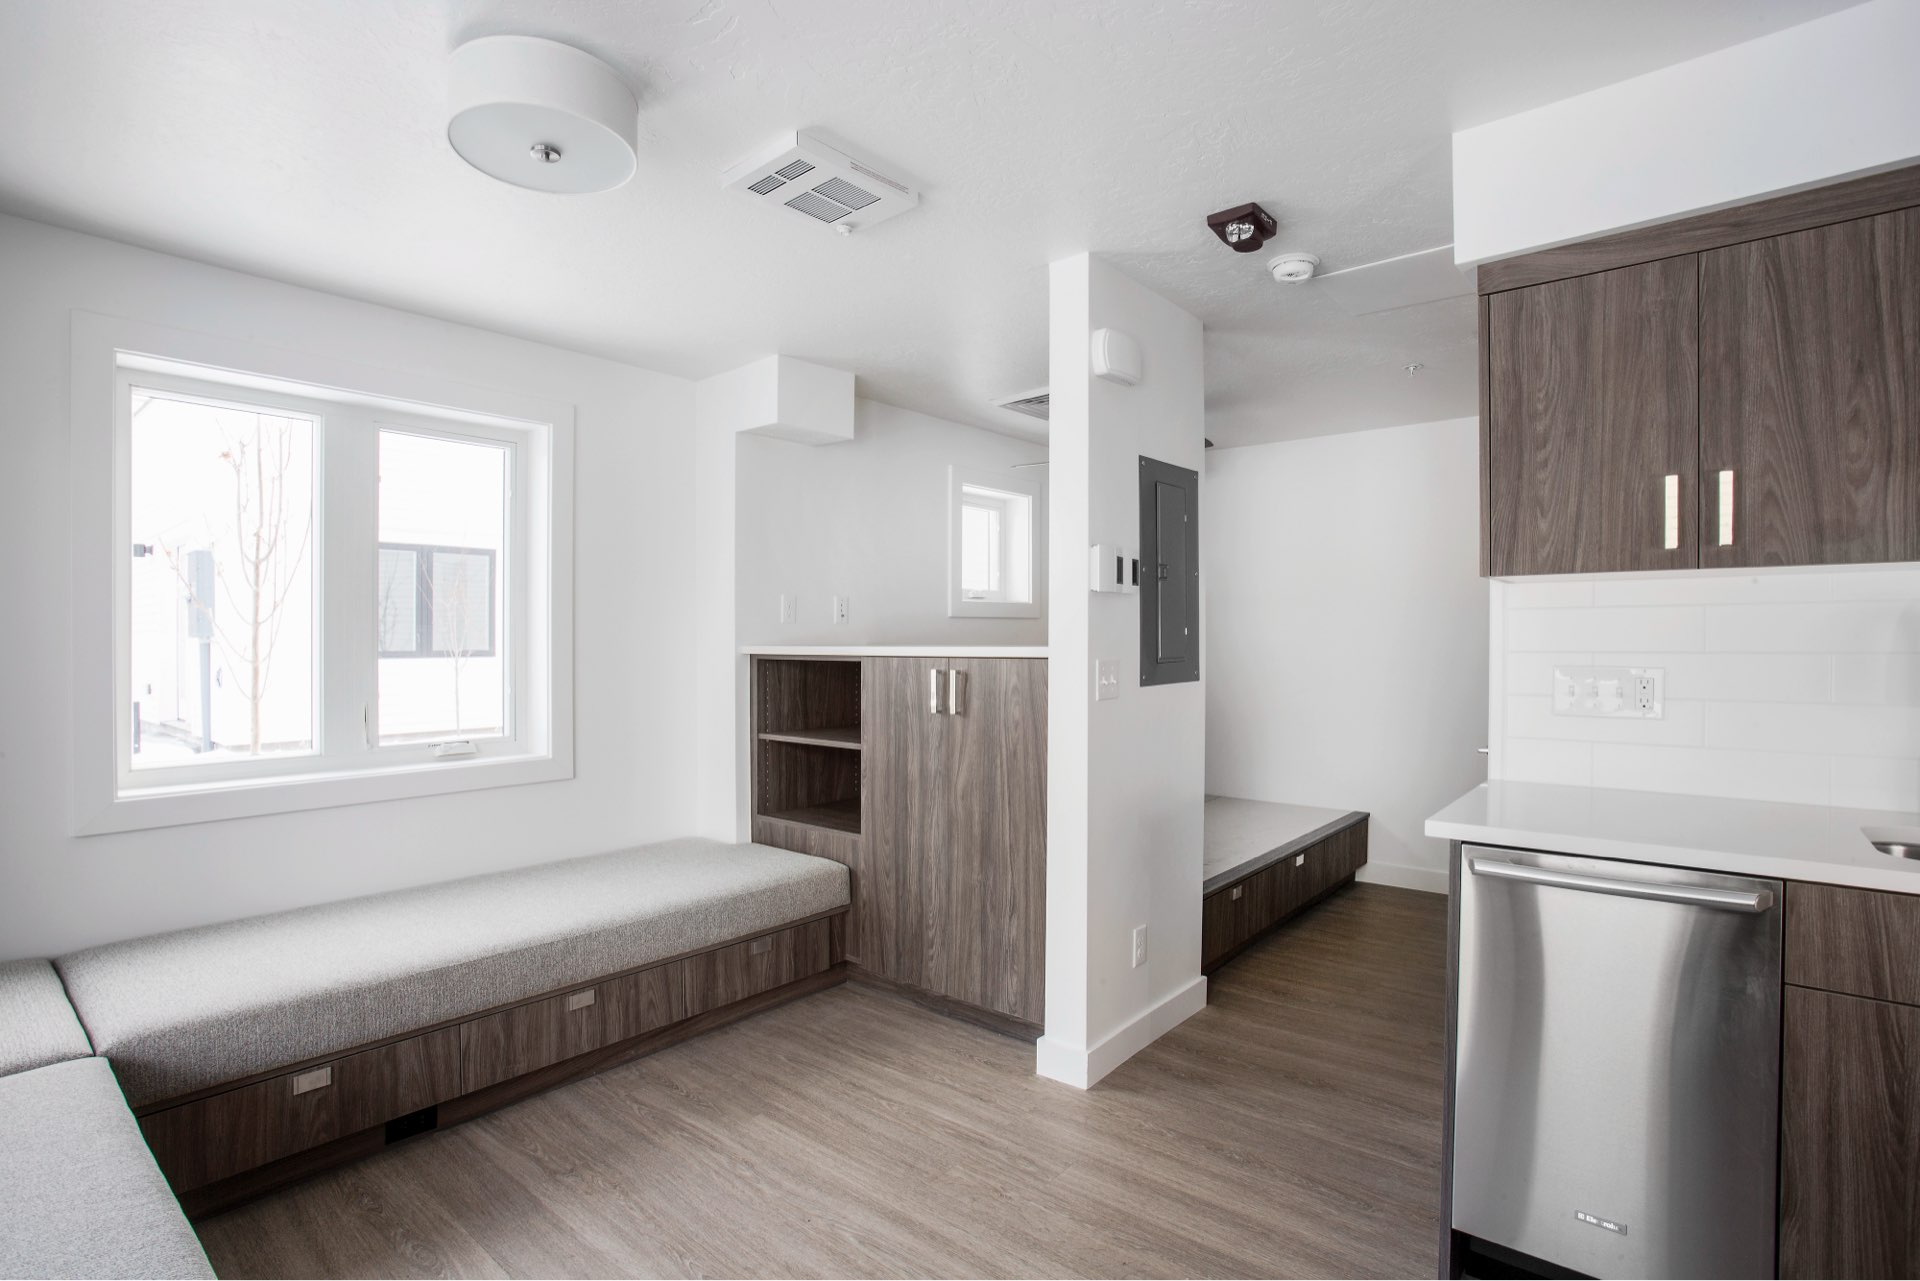 Dining nook, Woodside Park Affordable Housing, architectural design by Elliott Workgroup